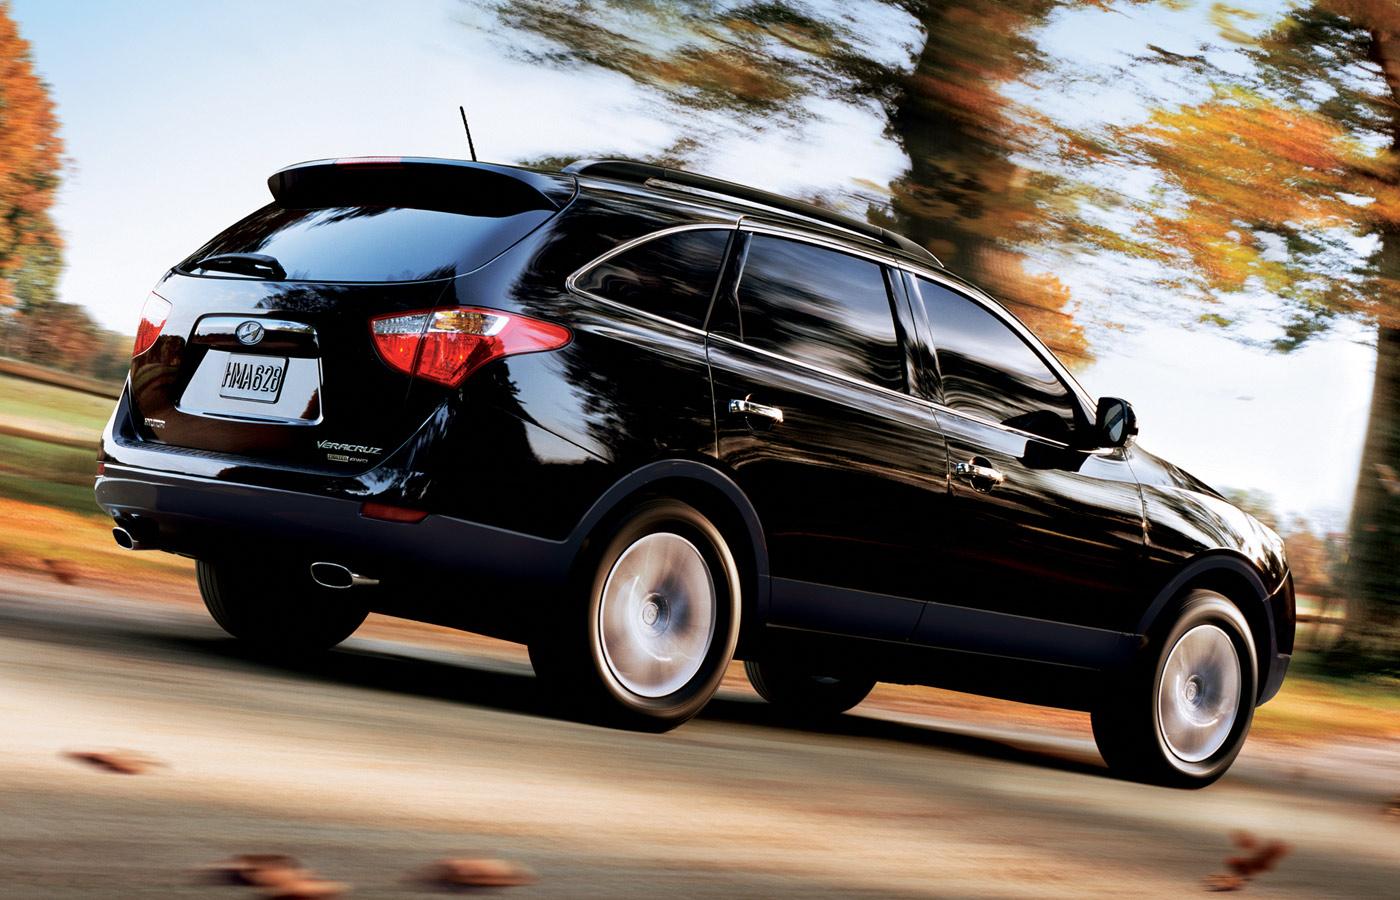 Hyundai-veracruz 3